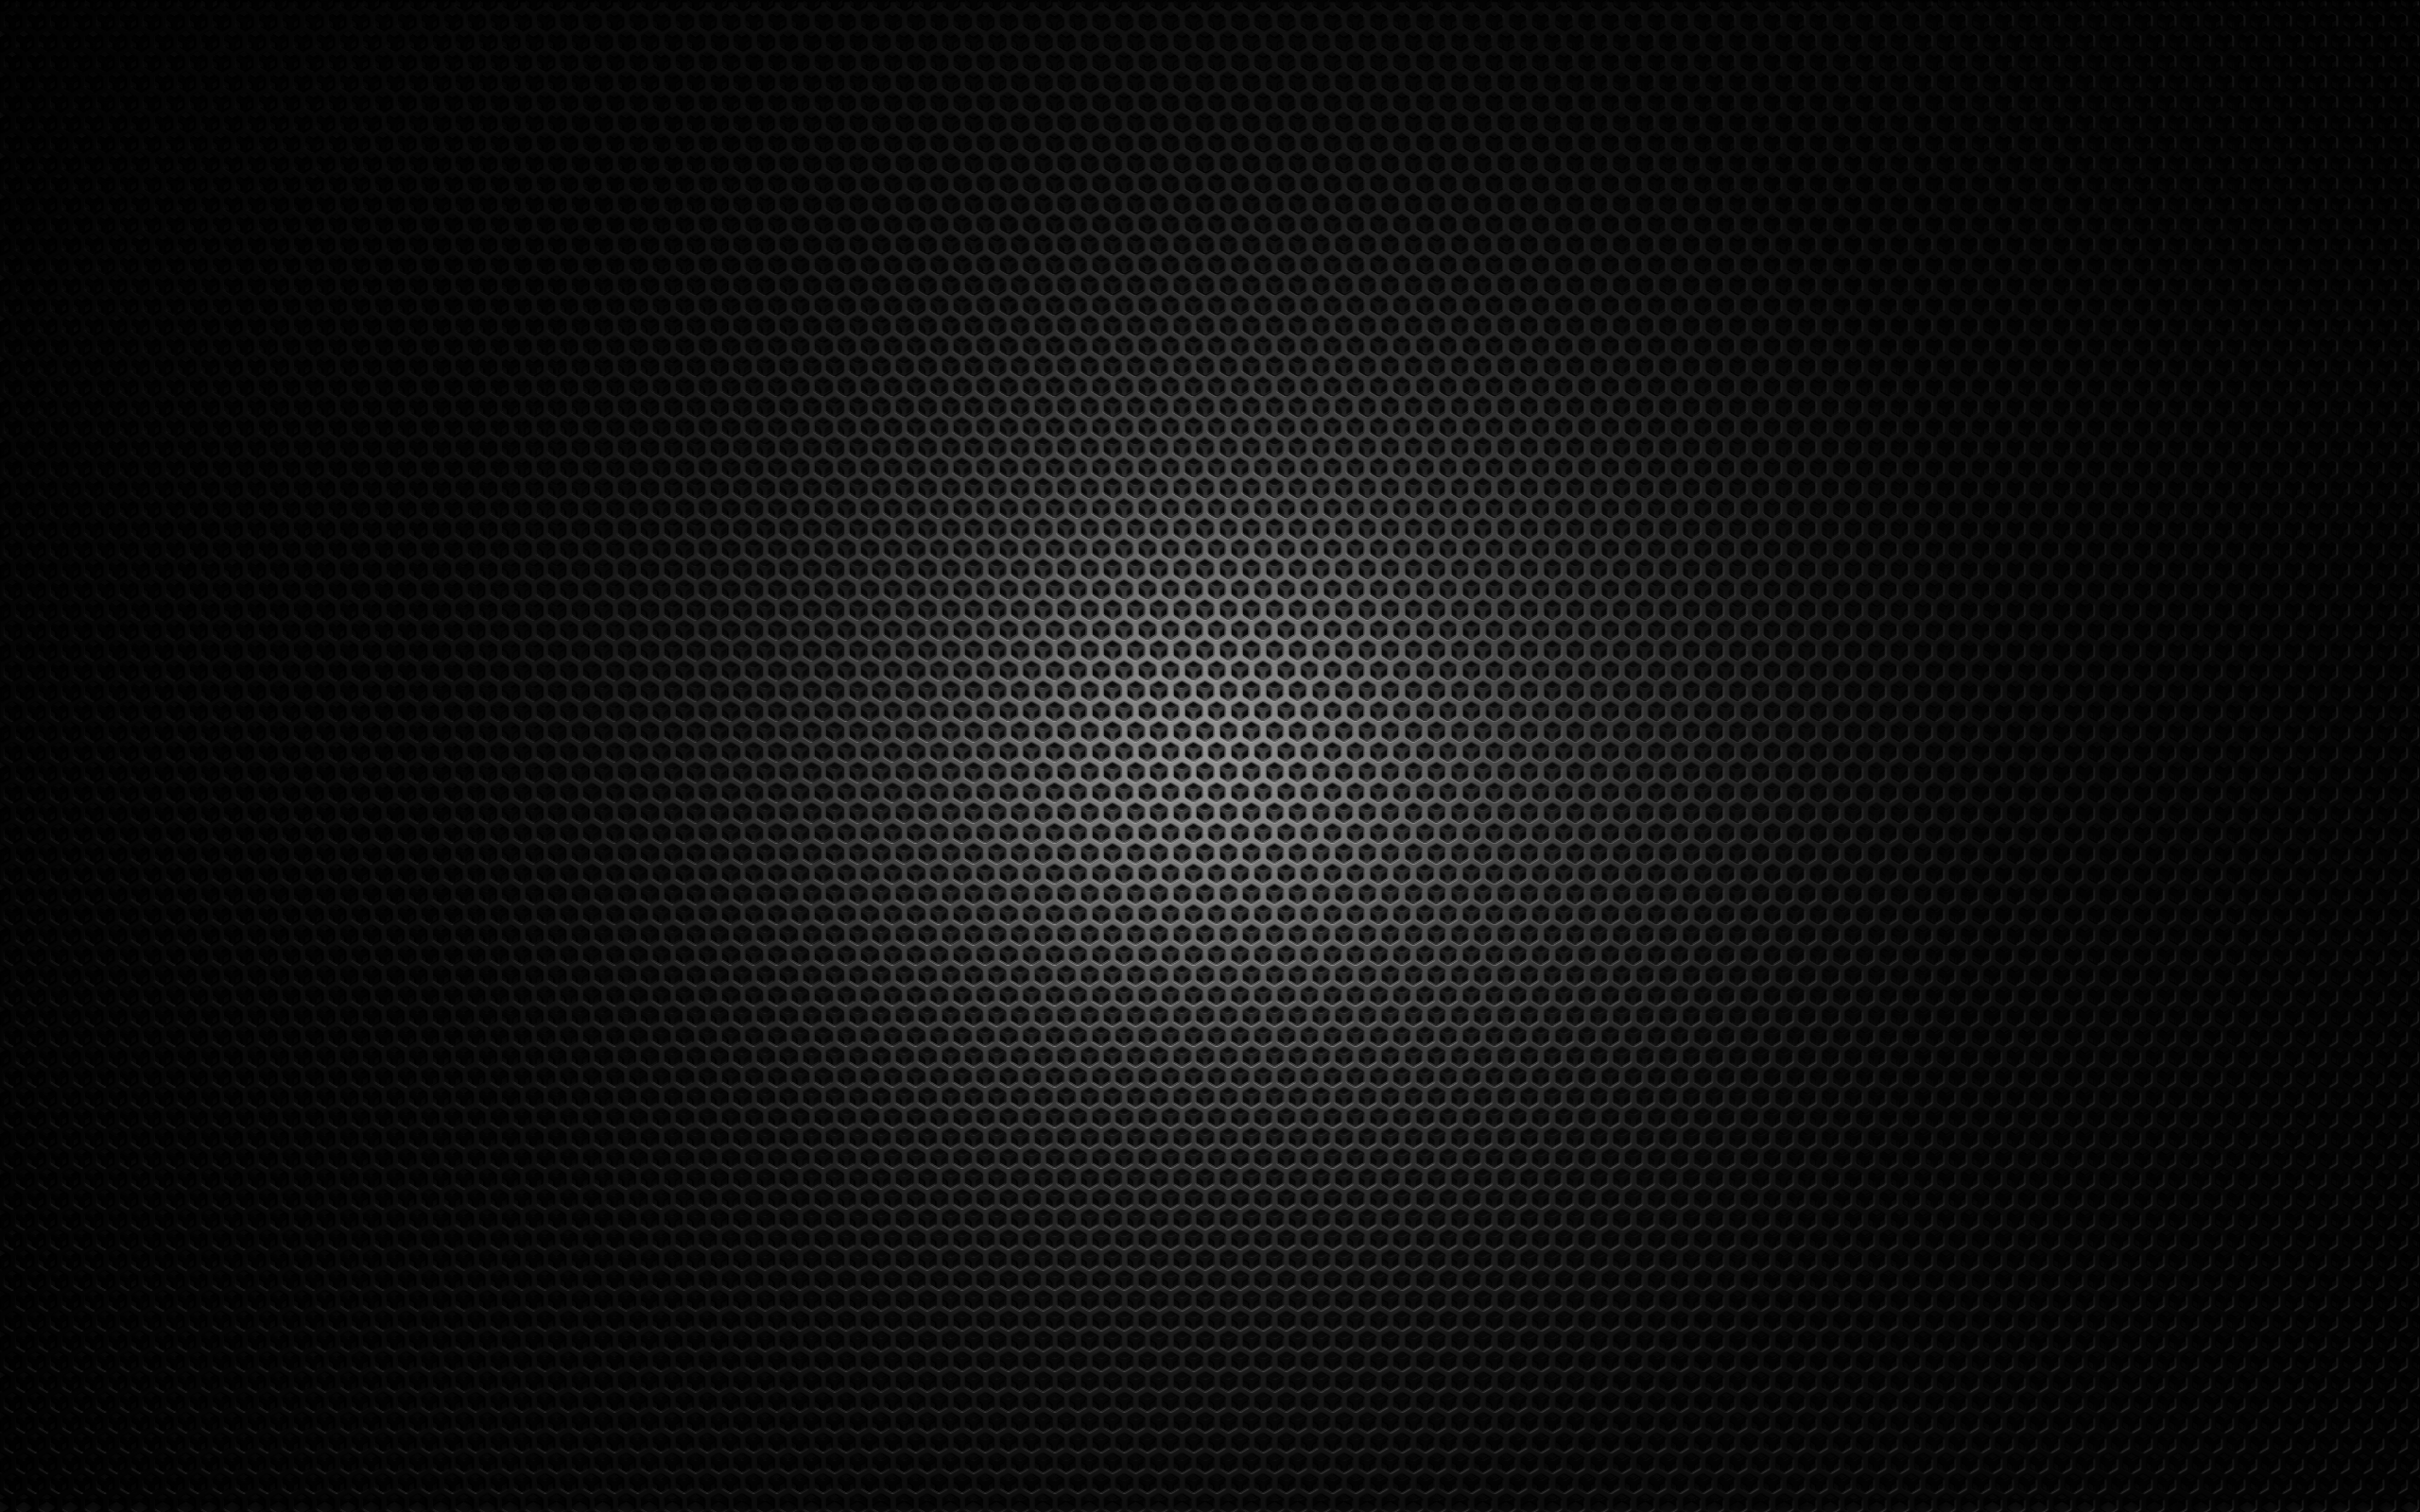 fileswordpresscom201002vista carbon no text or logo 2560x1600png 2560x1600